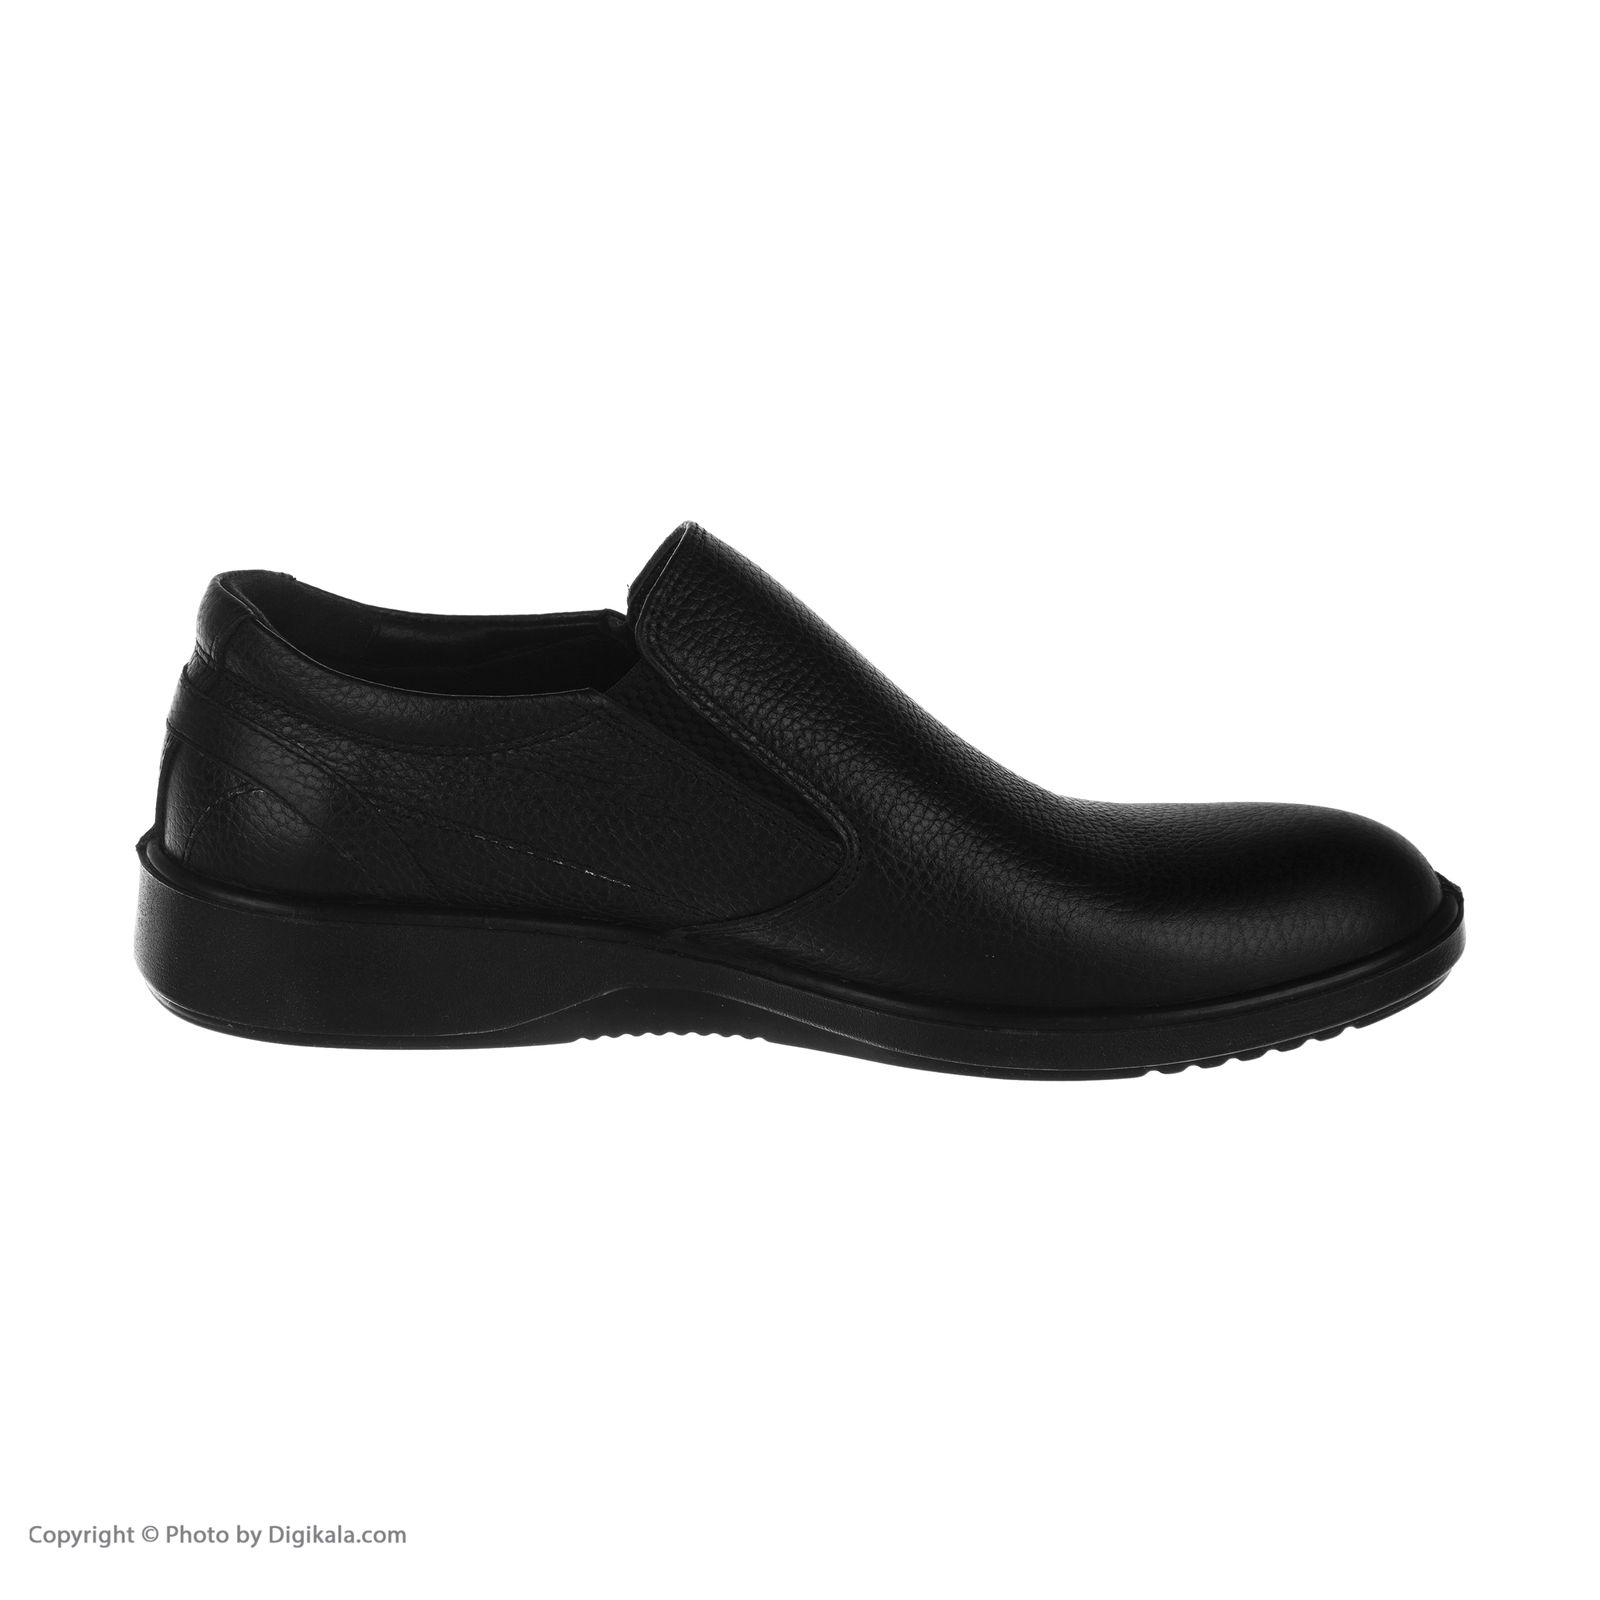 کفش روزمره مردانه ریمکس مدل 7327A503101 -  - 7